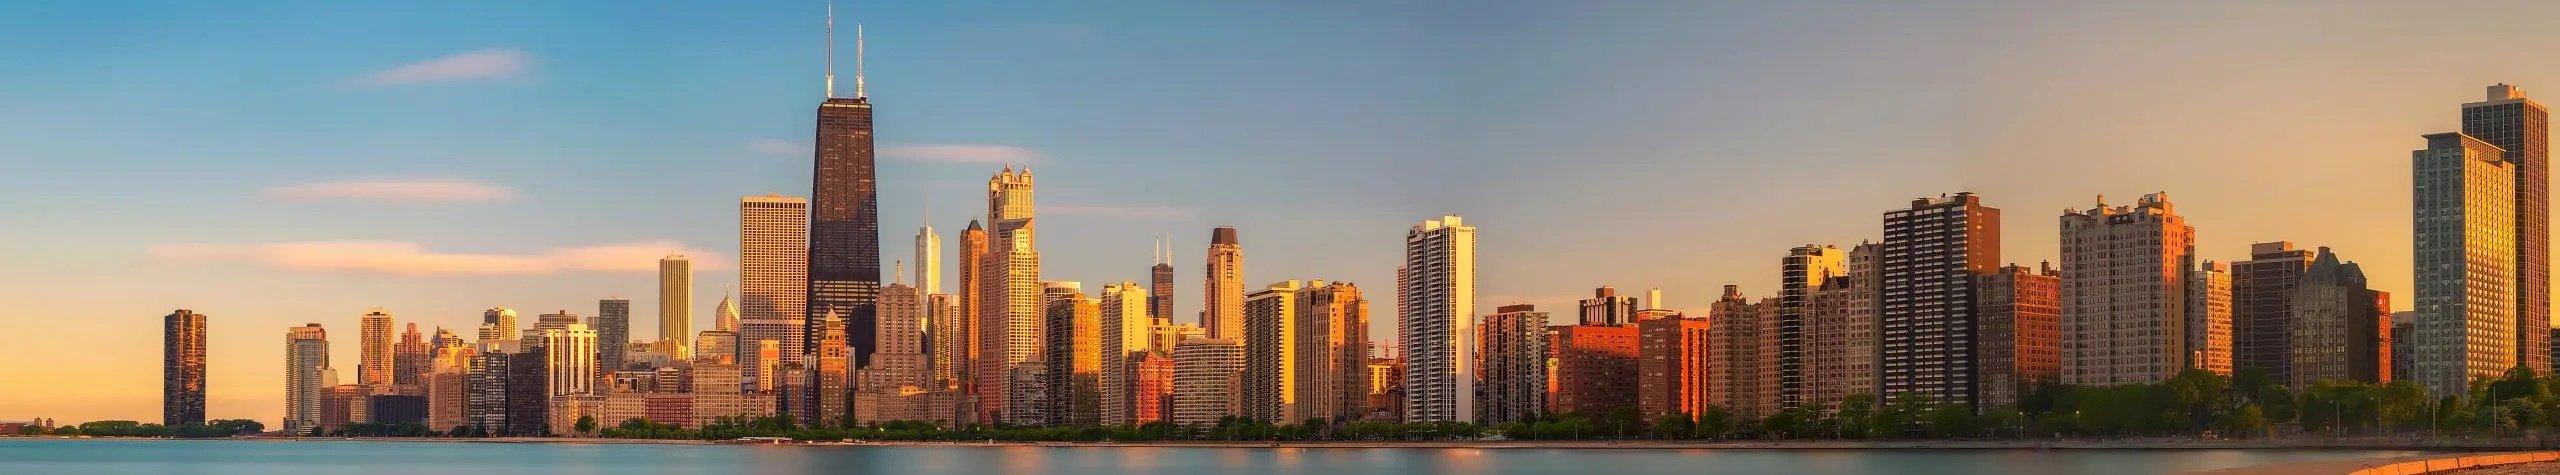 Chicago-Pana-scaled2